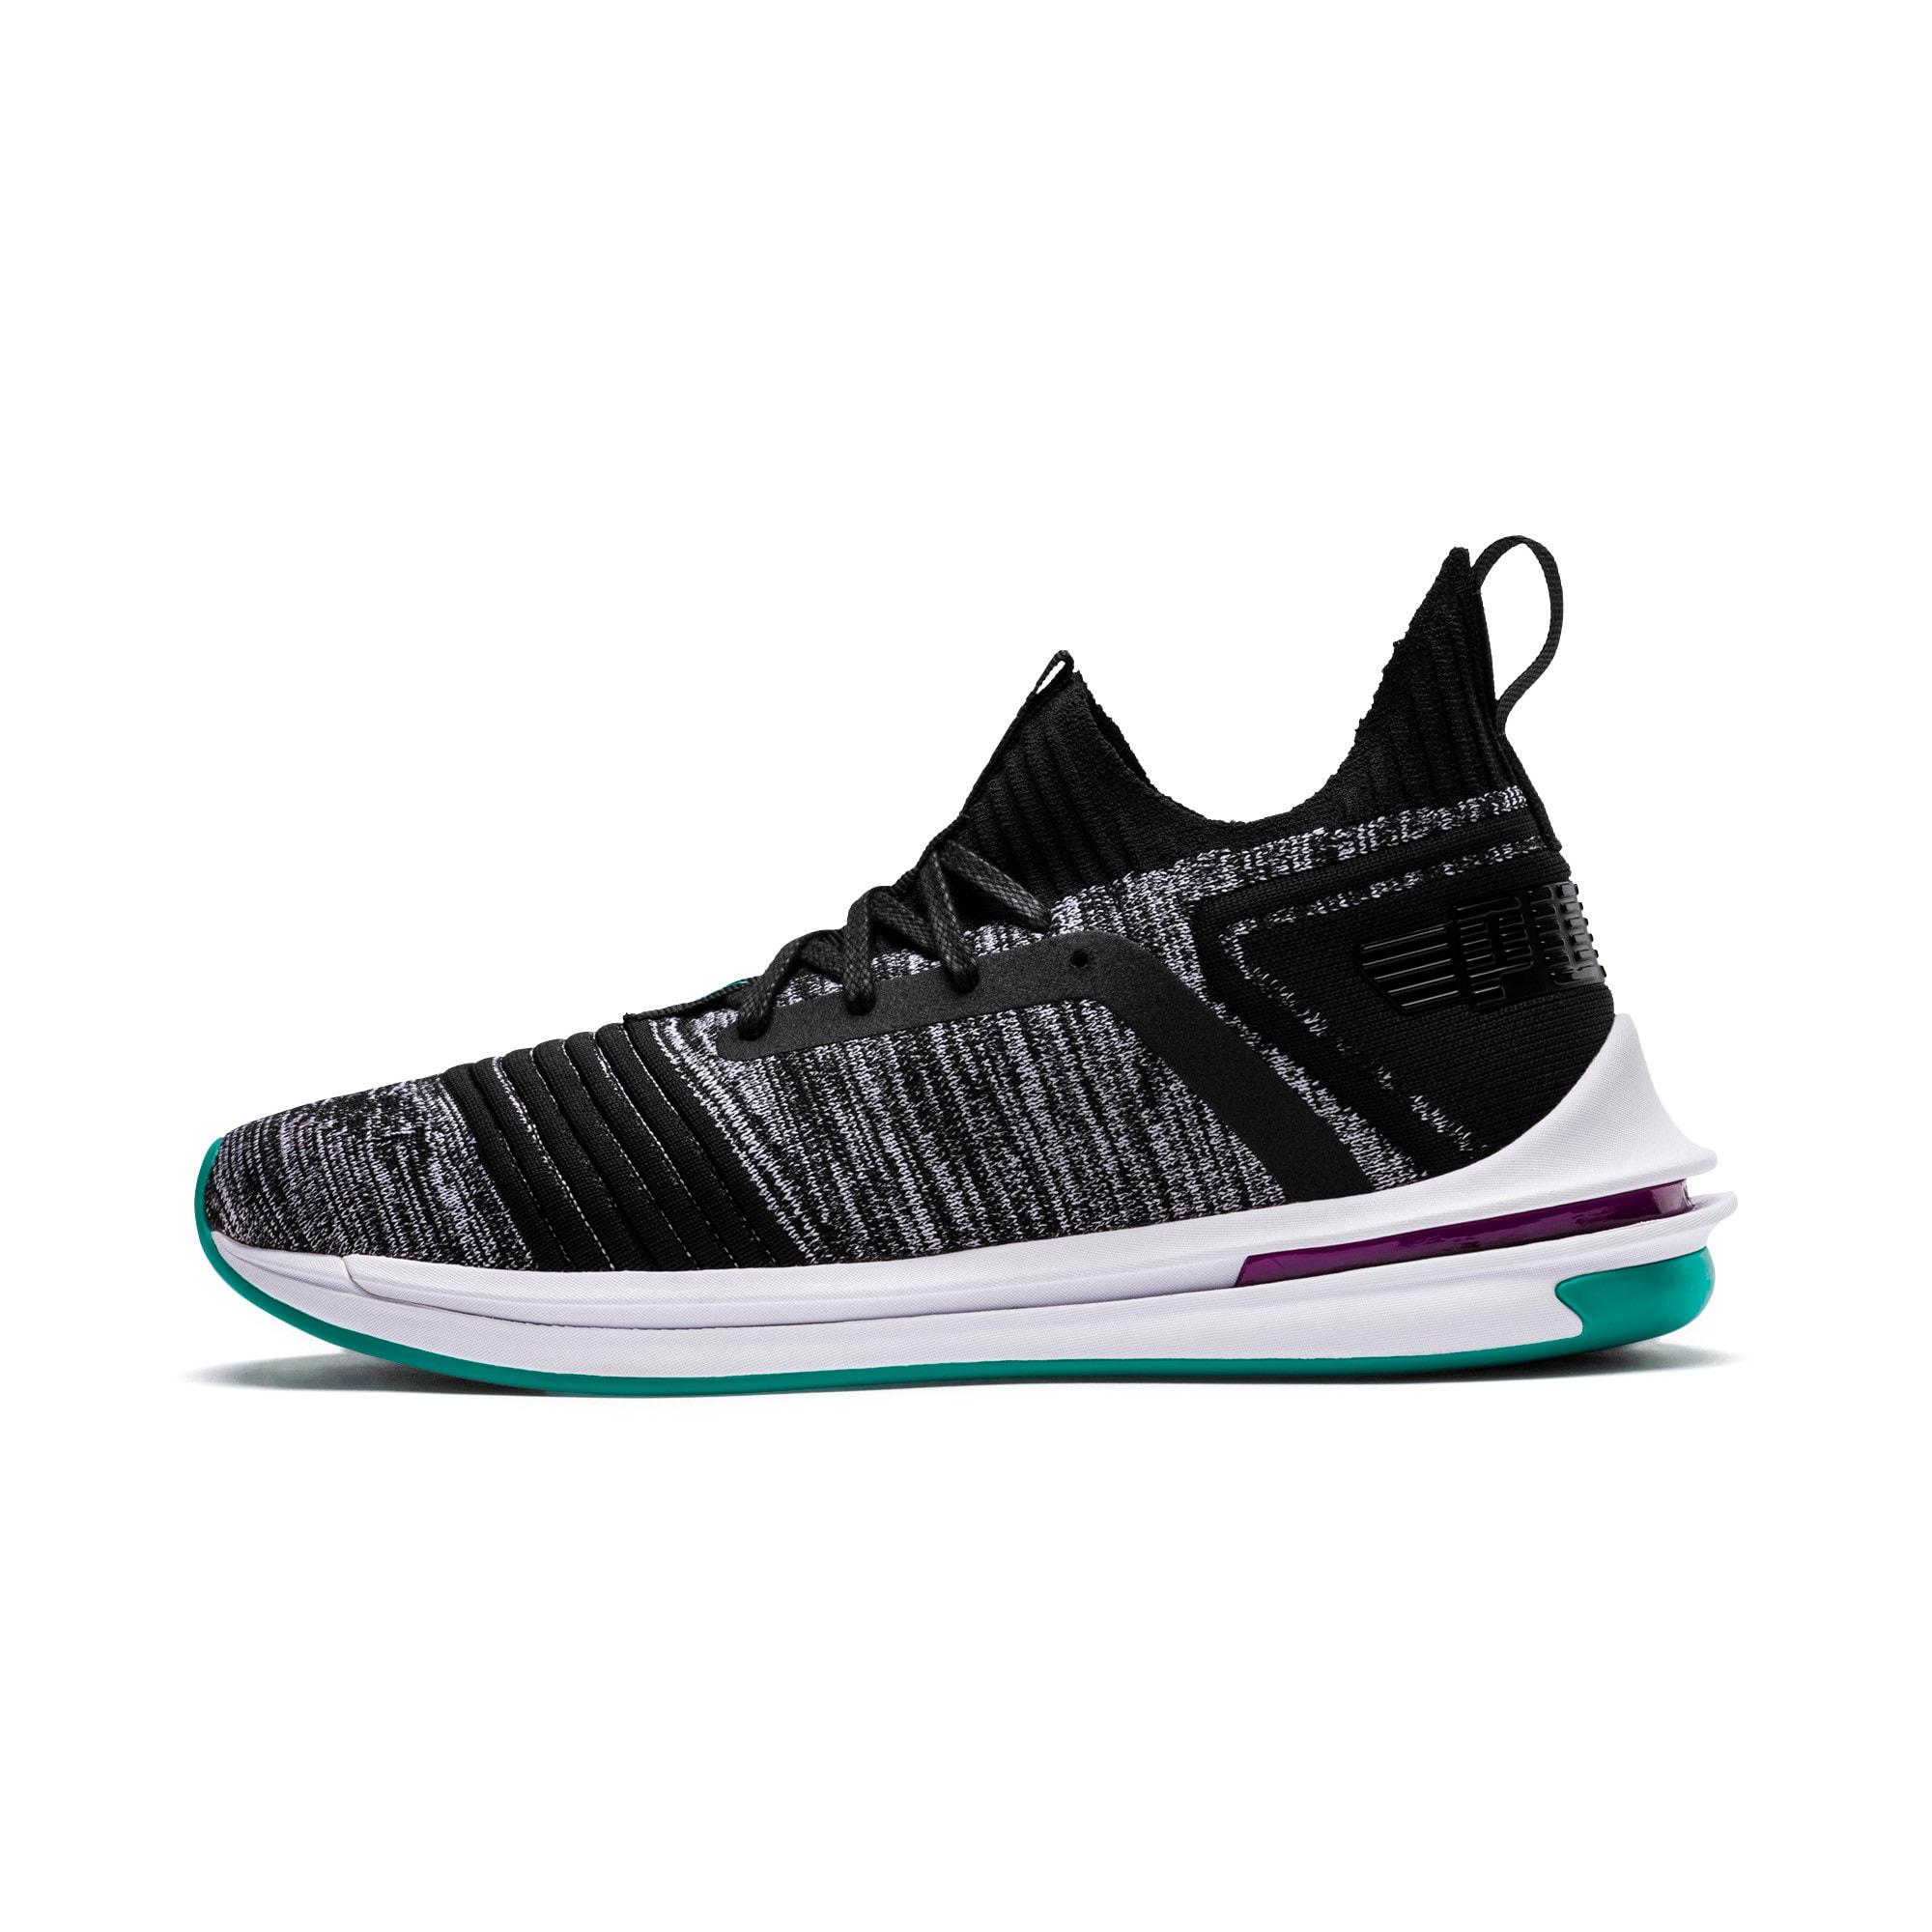 Thumbnail 1 of IGNITE Limitless SR evoKNIT Men's Sneakers, Puma Black-Spectra Green, medium